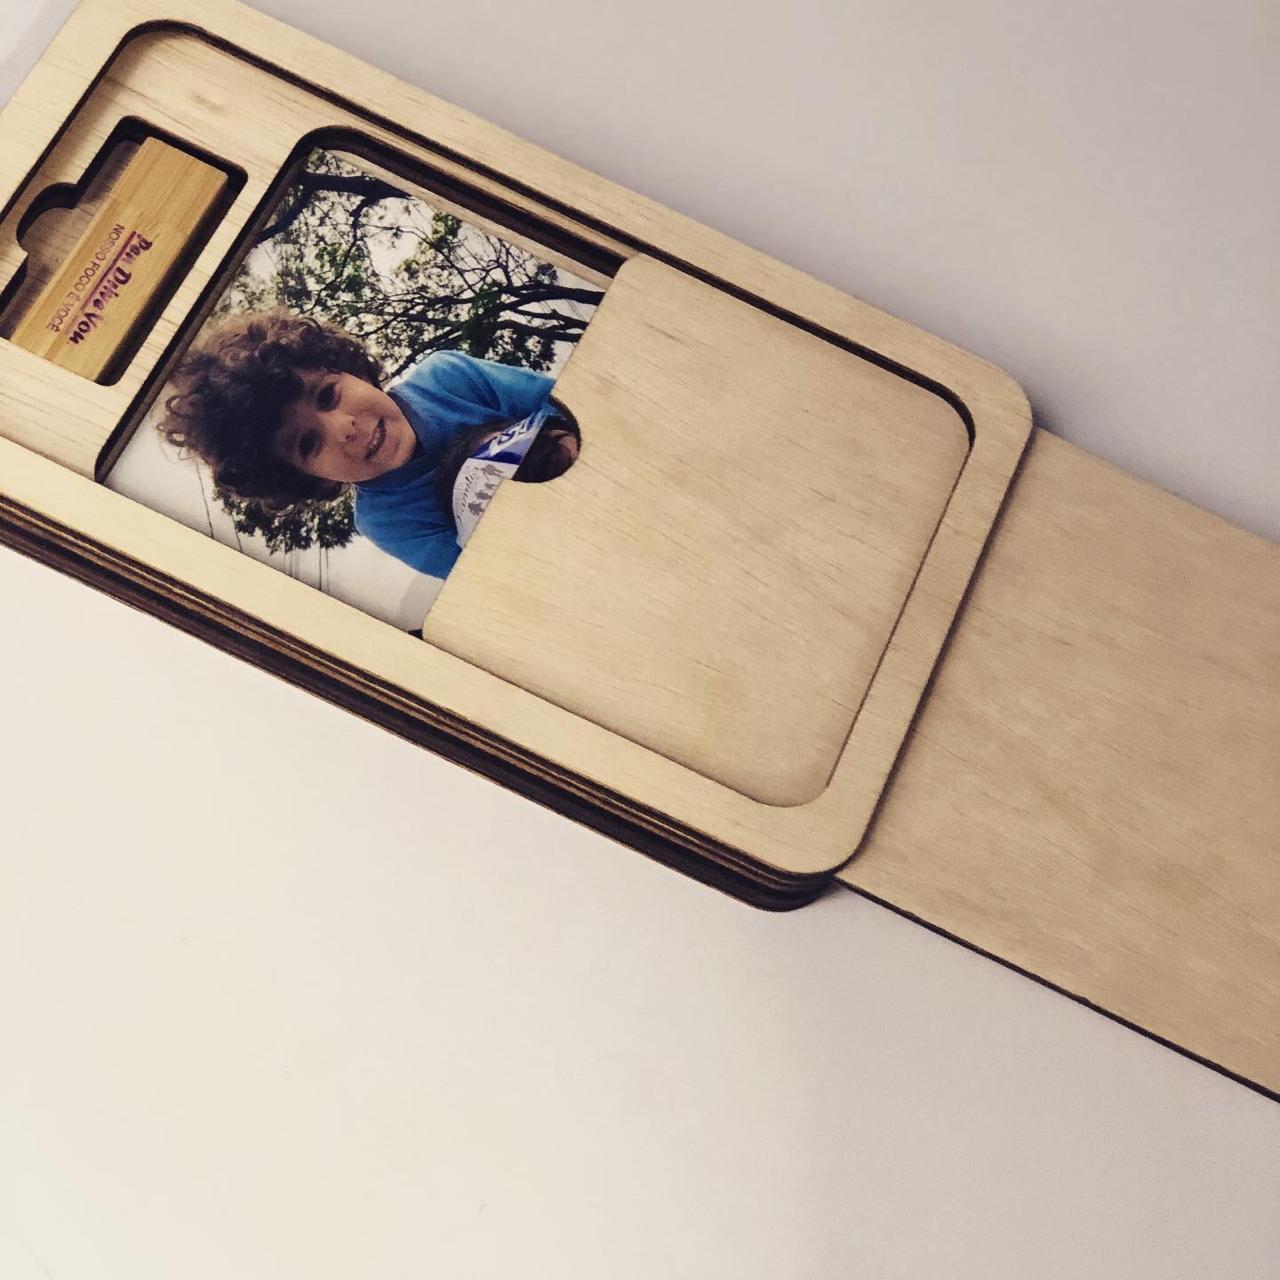 Case Madeira p/ Pen Drive e Foto 10x15 Wood Frame V